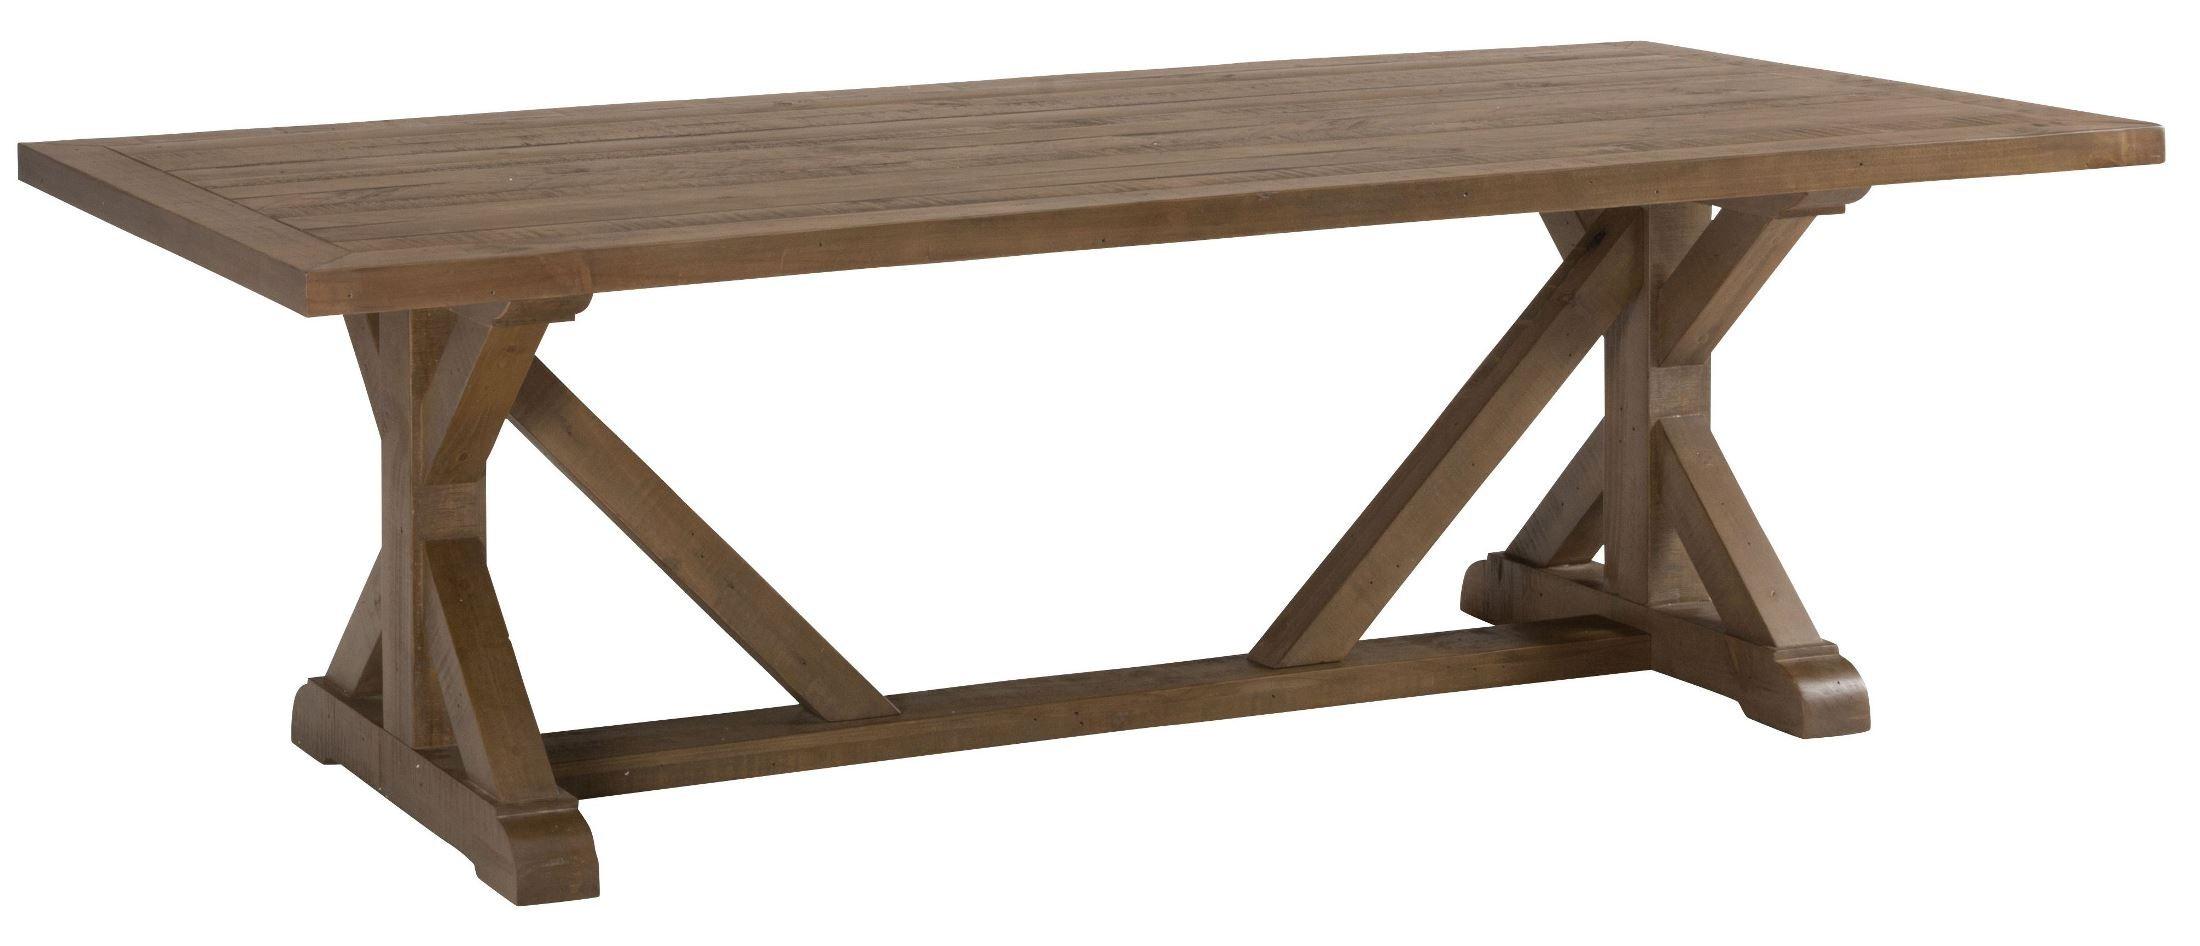 Slater Mill Reclaimed Pine Trestle Dining Table 941 97 Jofran